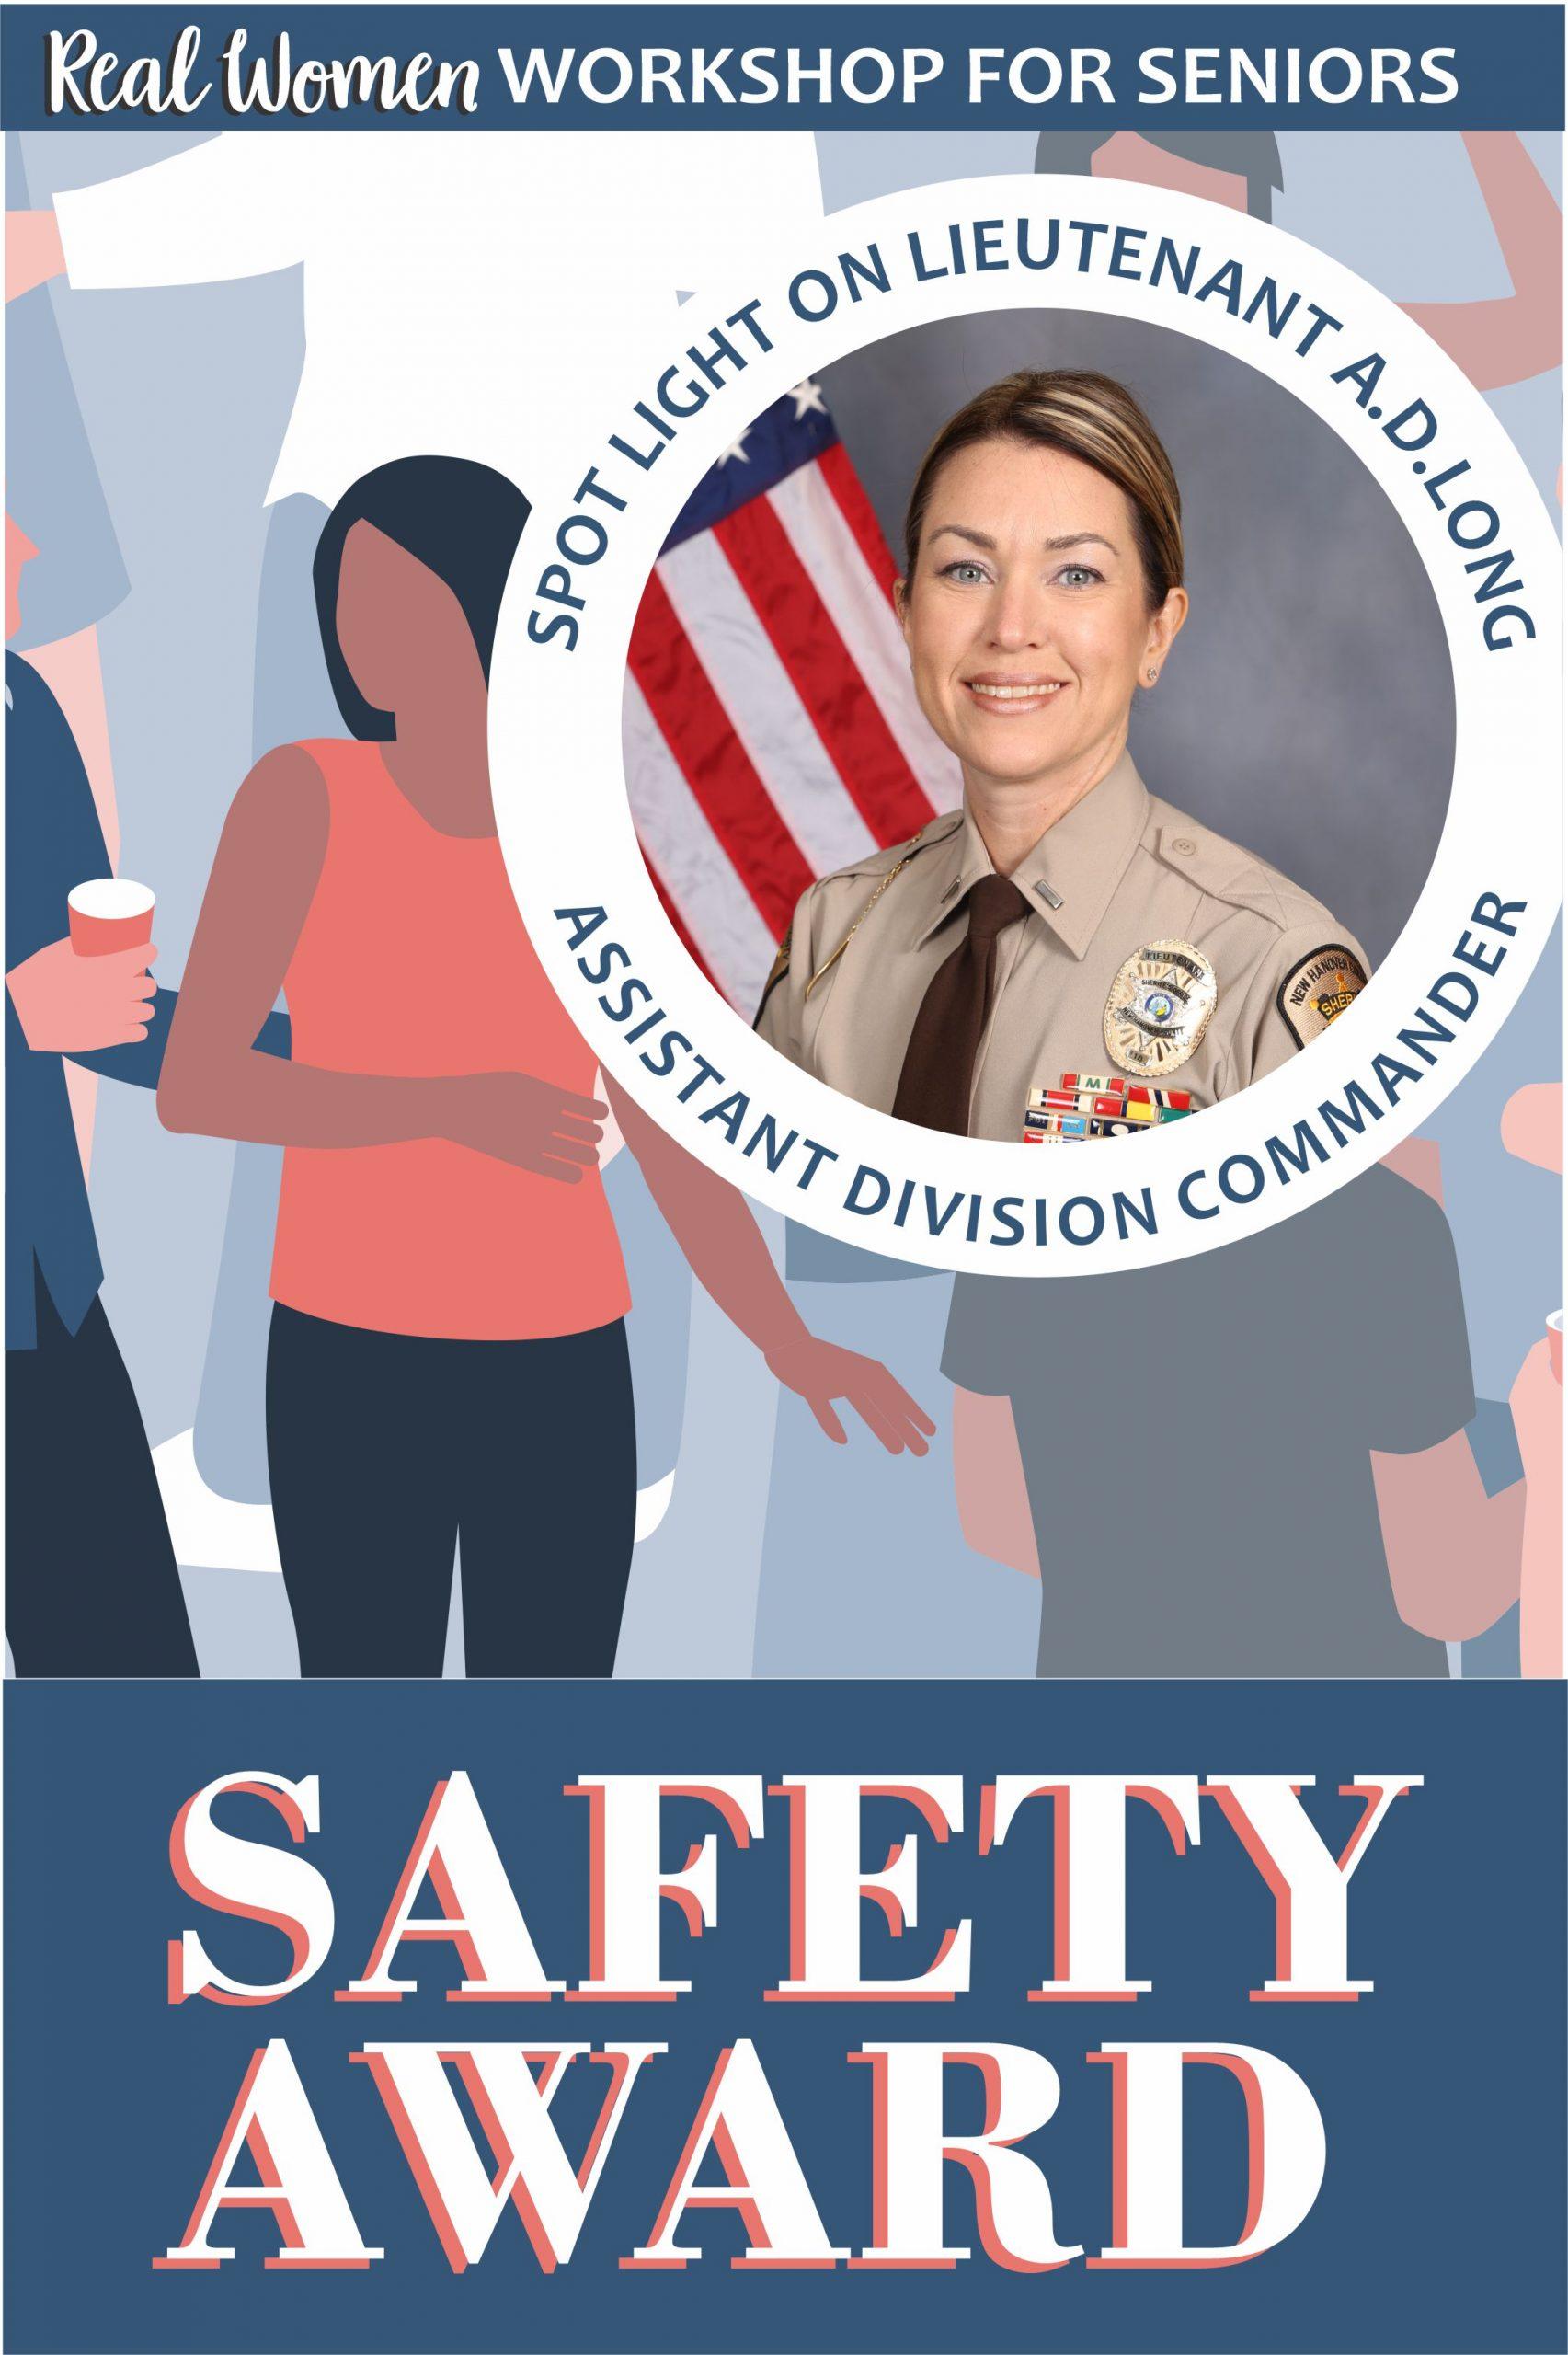 Girl Scout Safety Award for Seniors Virtual Workshop via @gsleader411